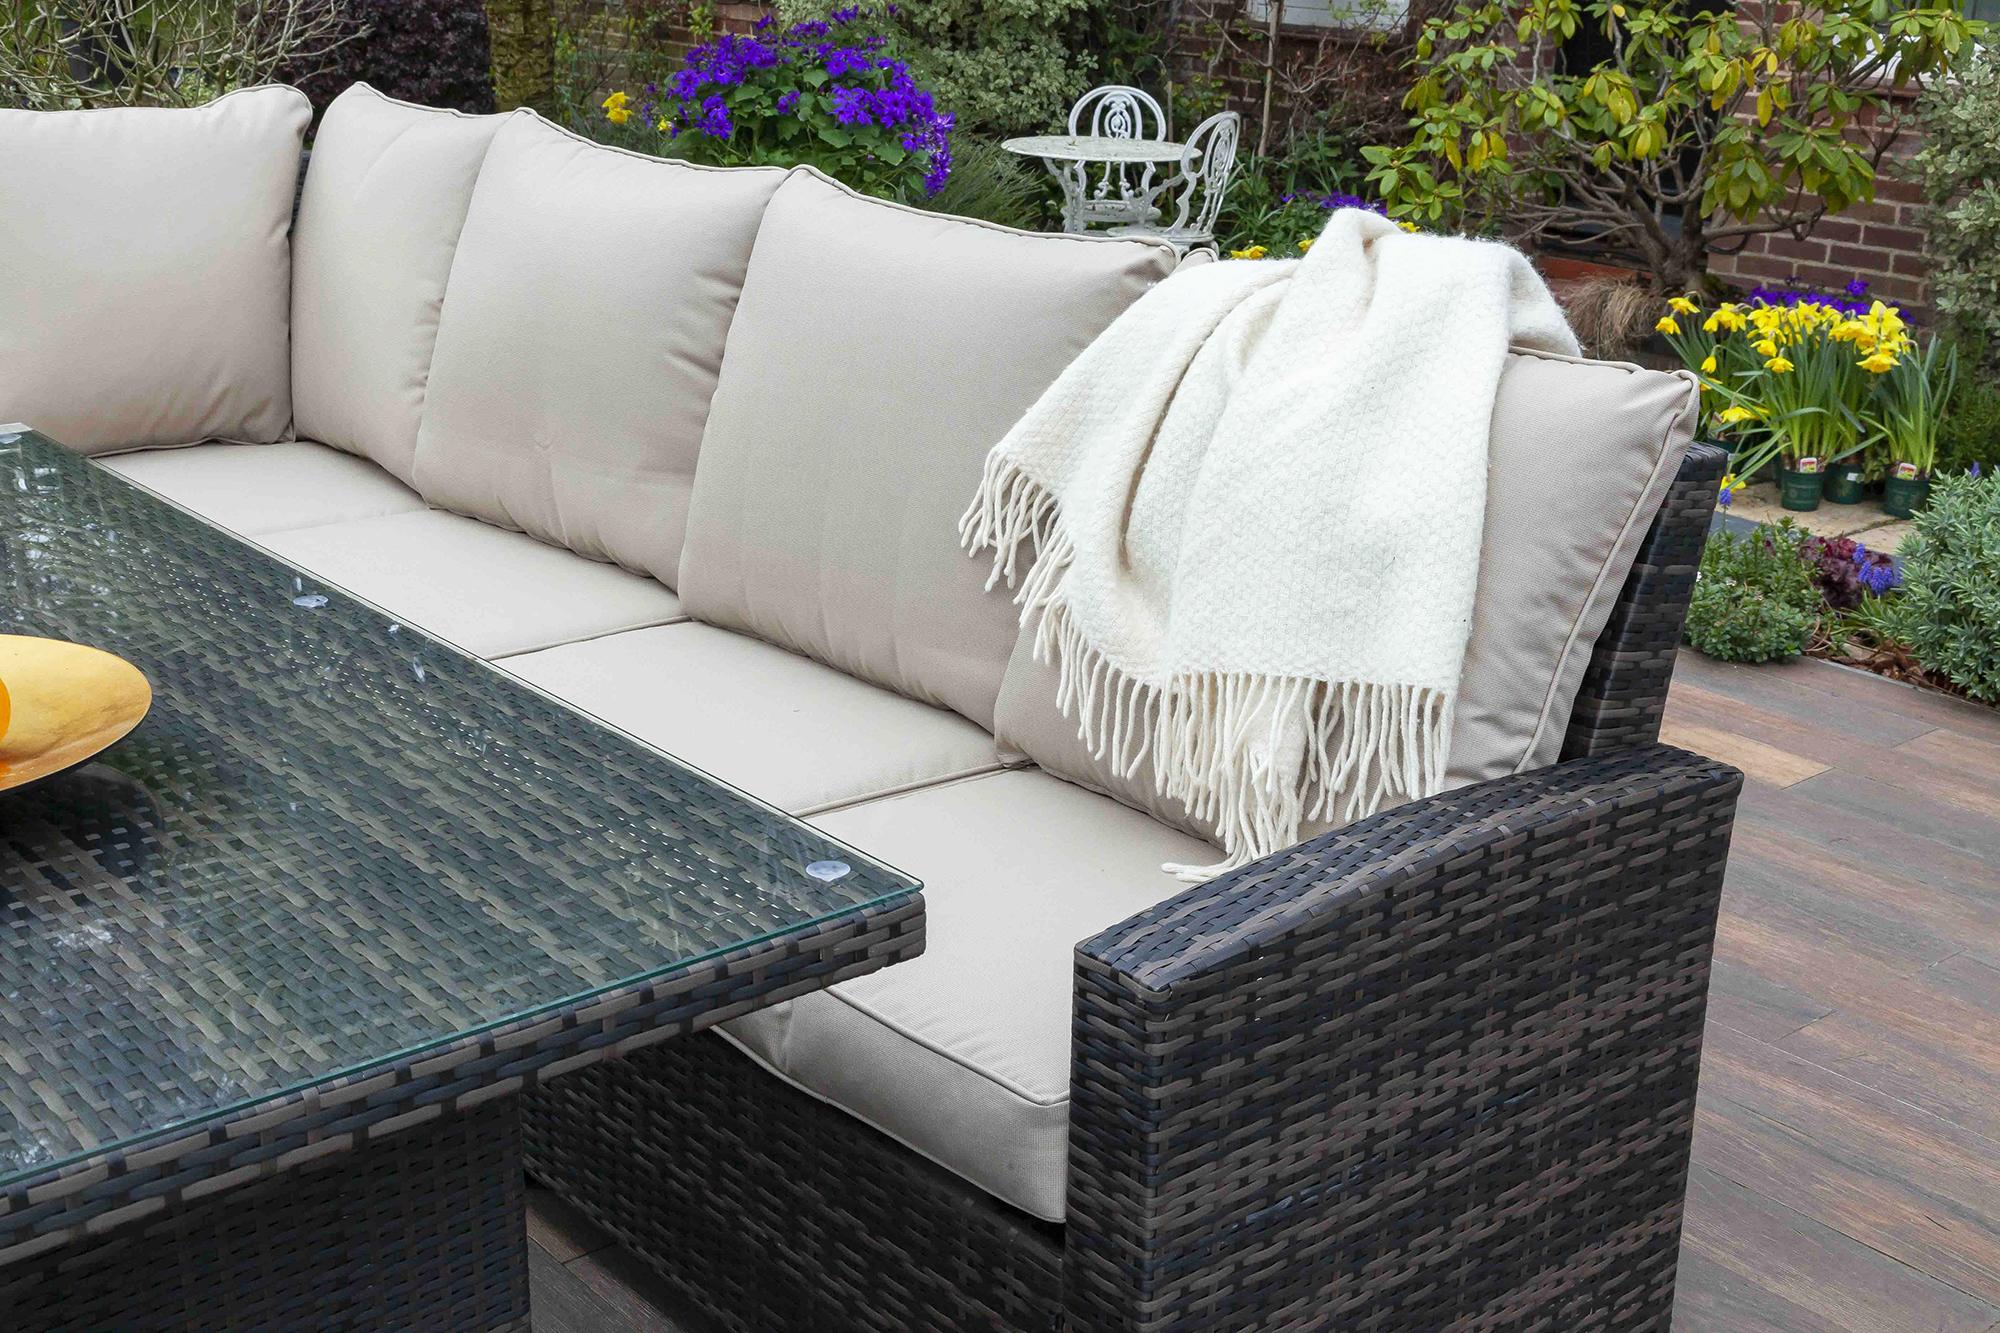 Win an outdoor rattan dining set